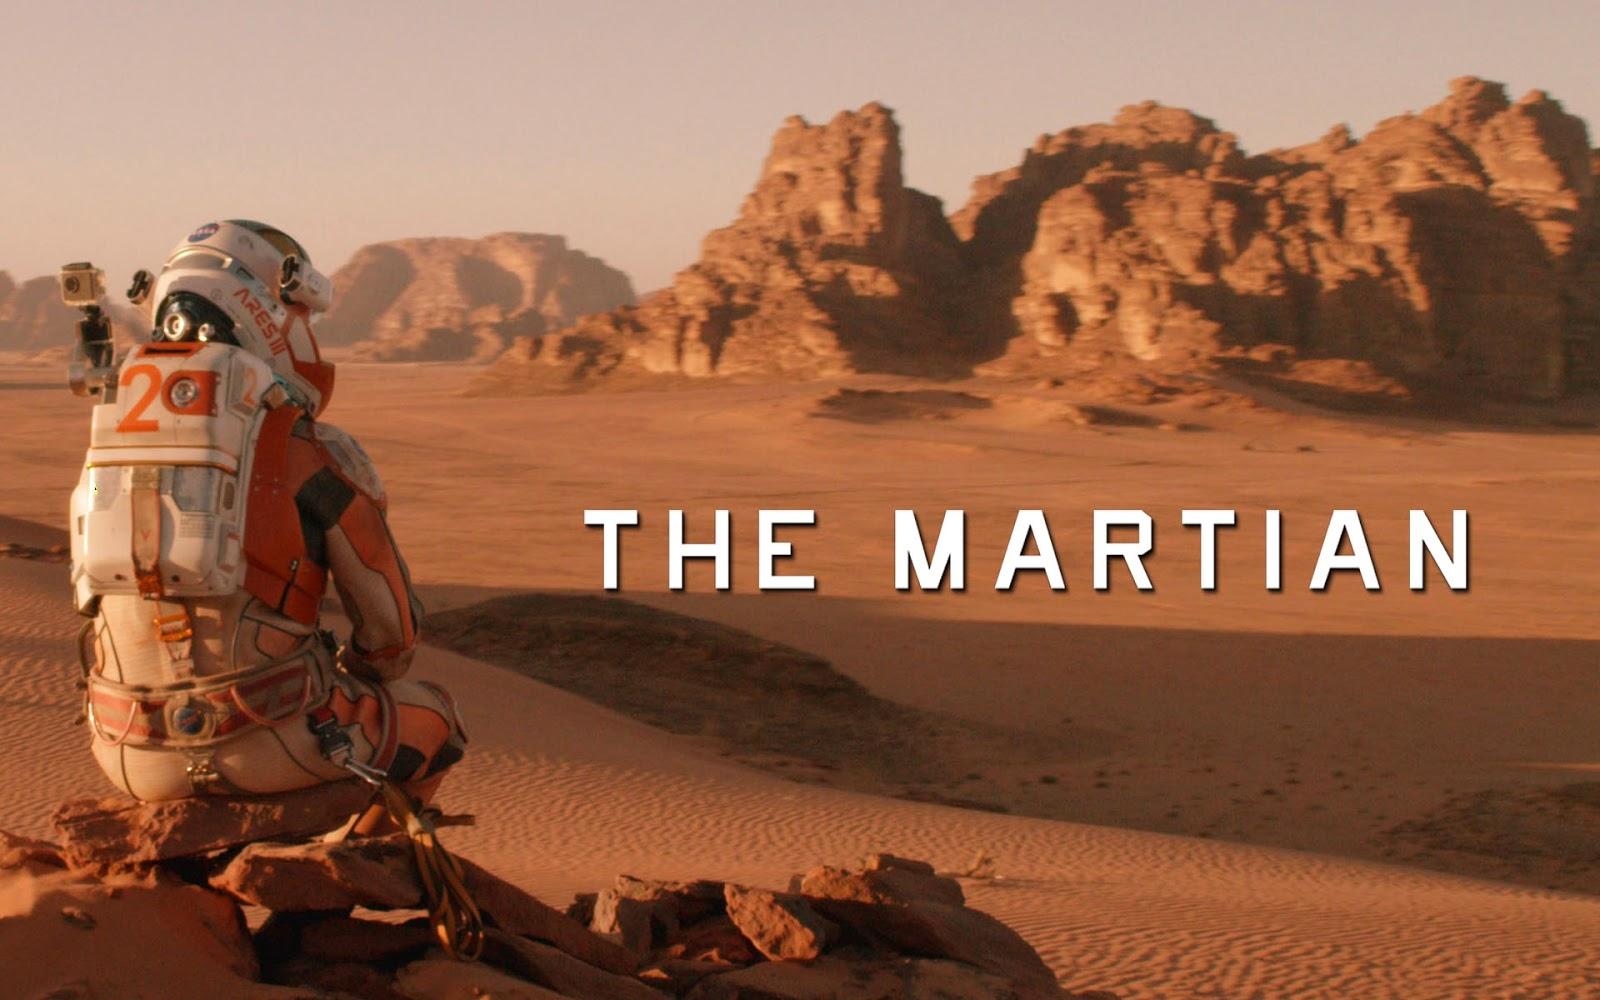 sci fi movie essay